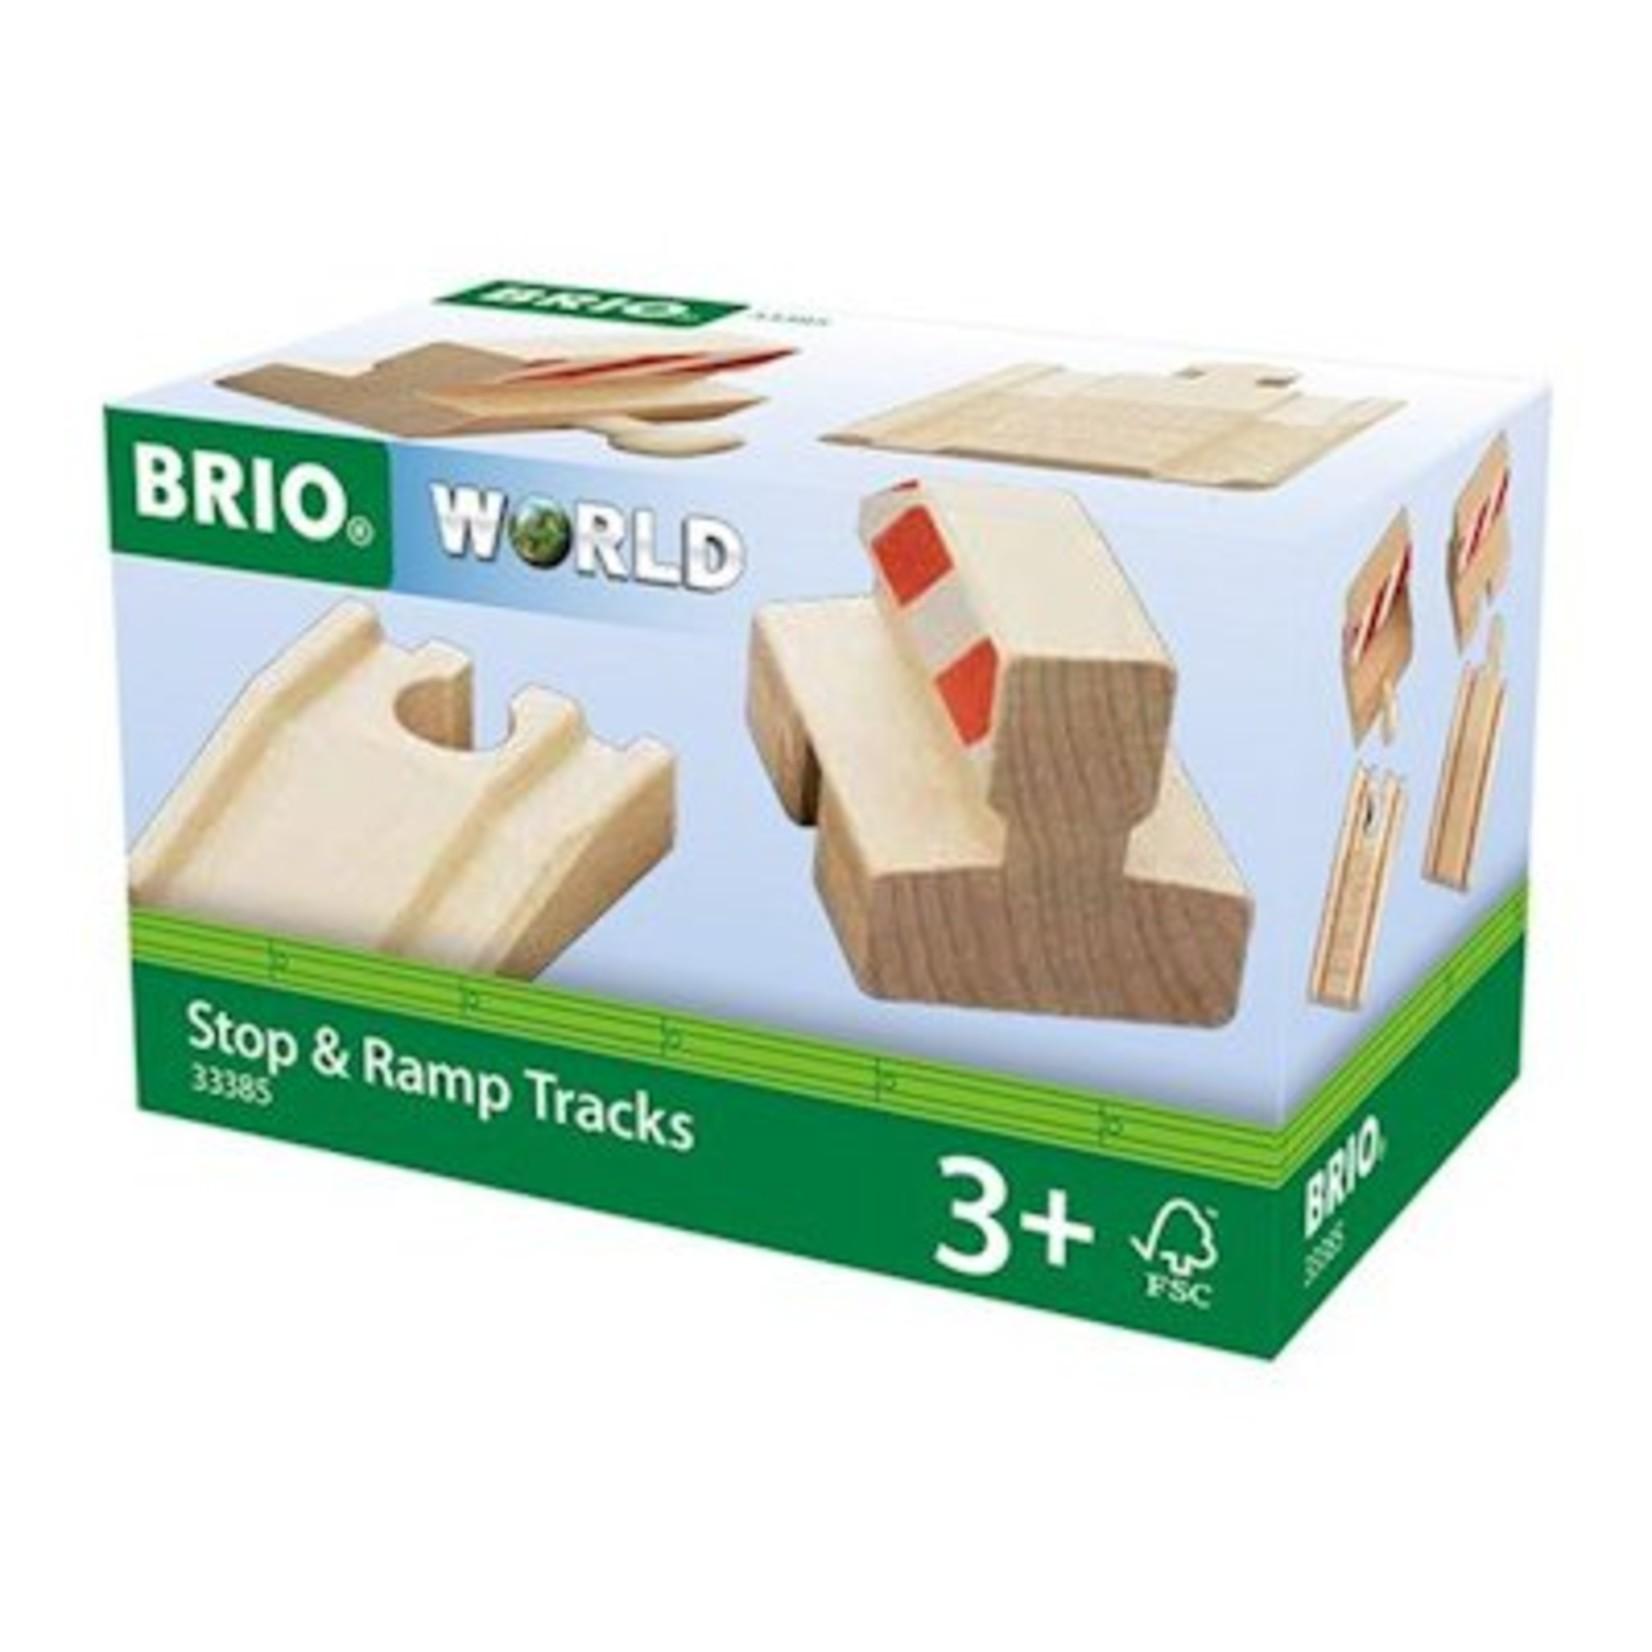 Brio Stop & ramp rail